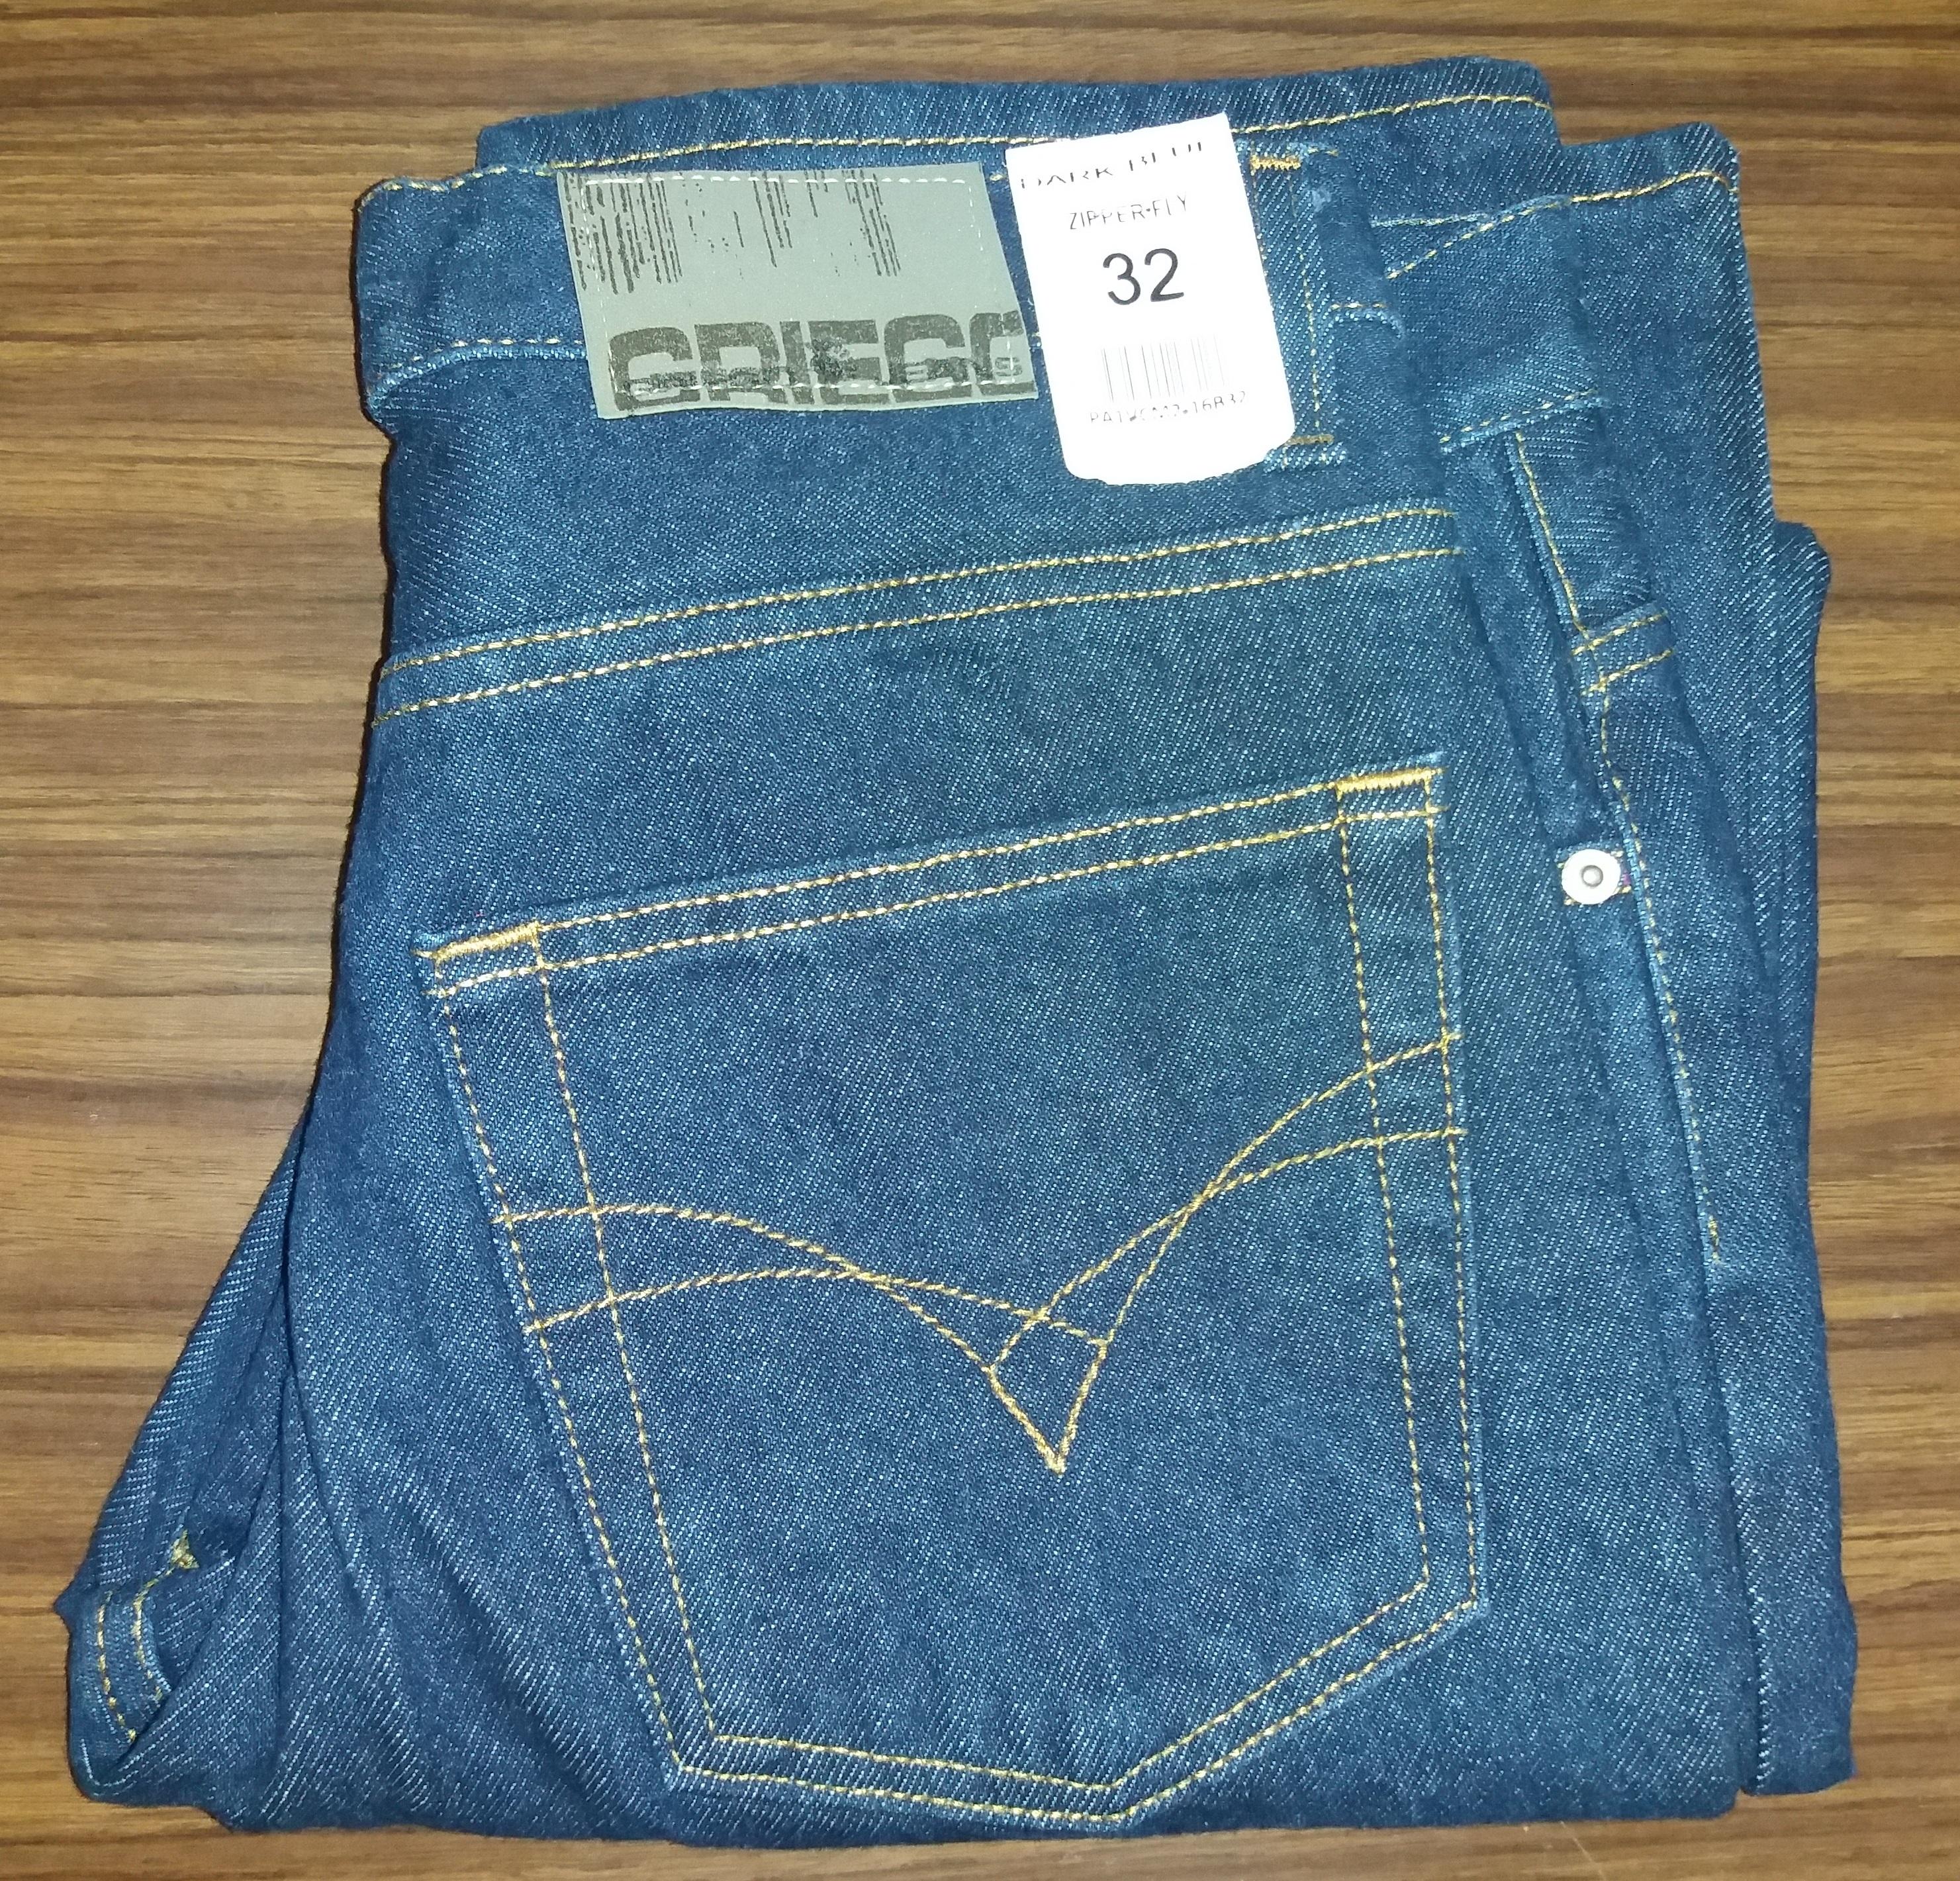 pantalon griego mezclilla